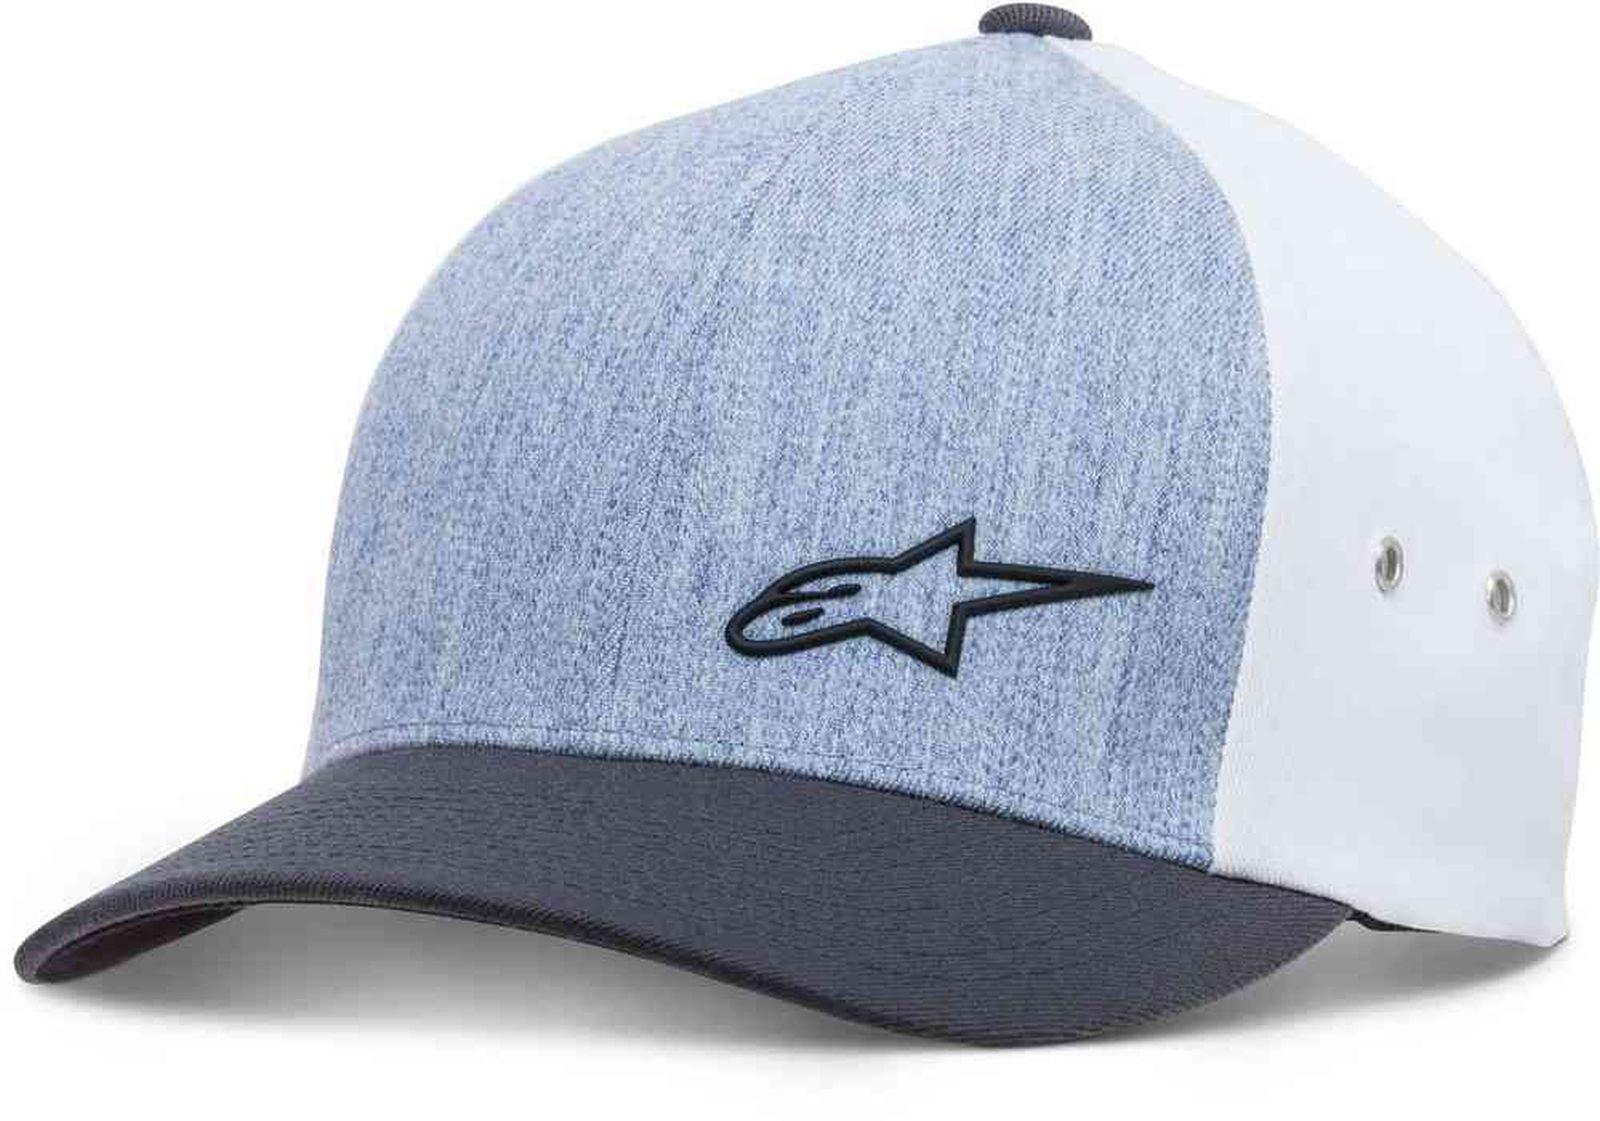 TRANSFER HAT